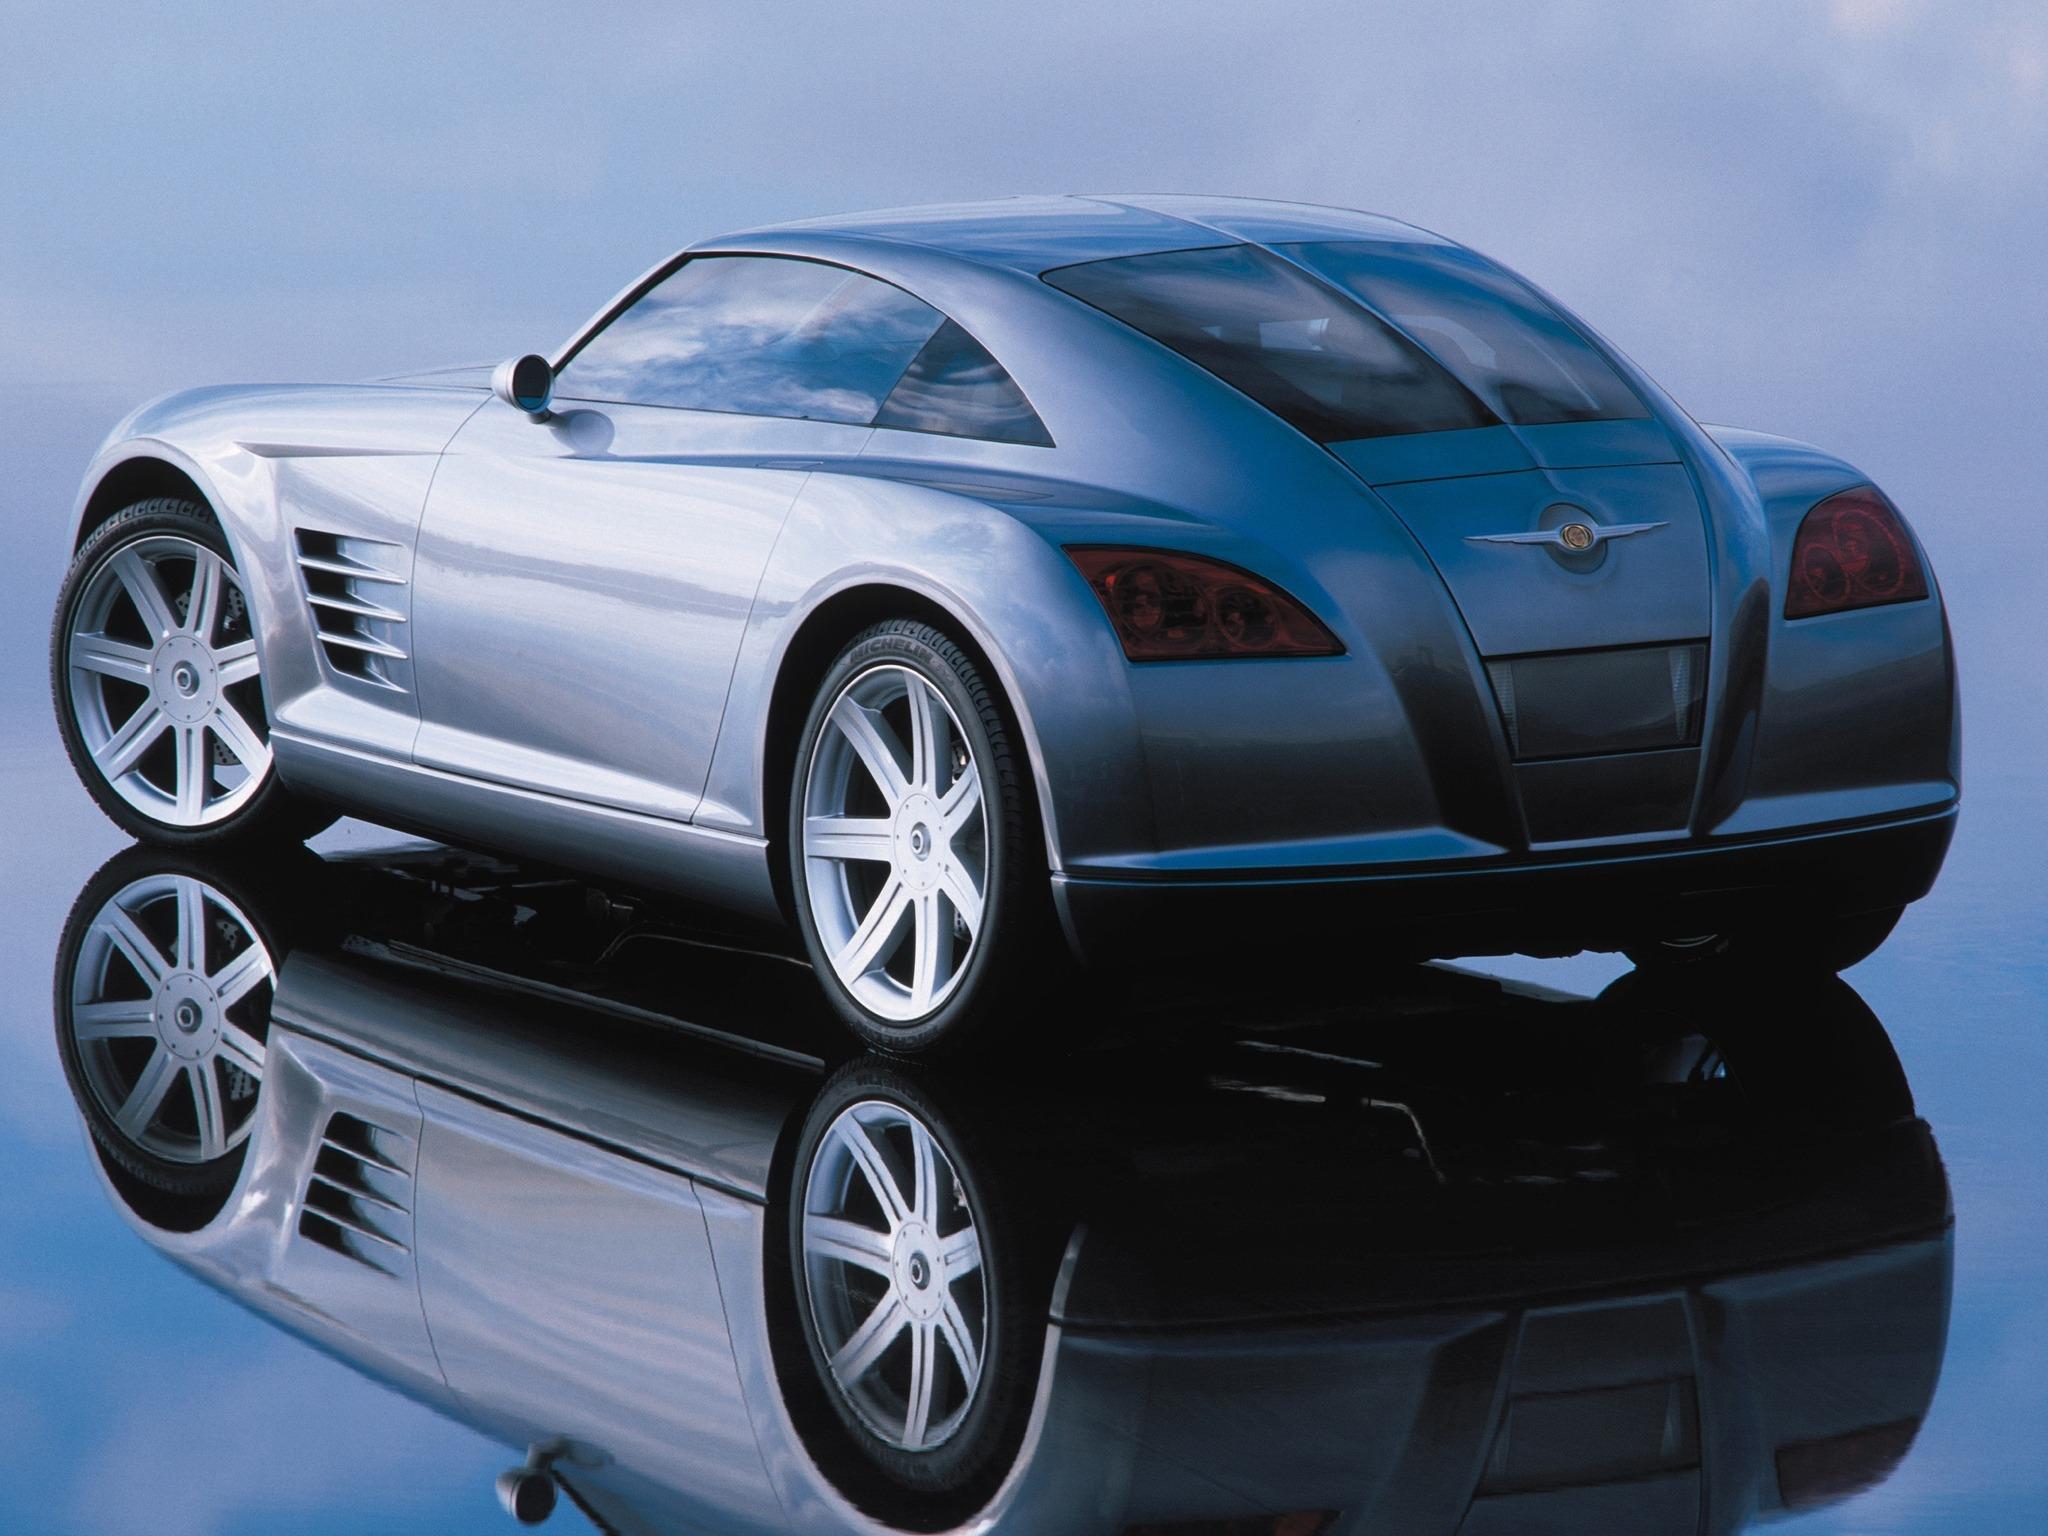 Chrysler Crossfire Concept (2001)